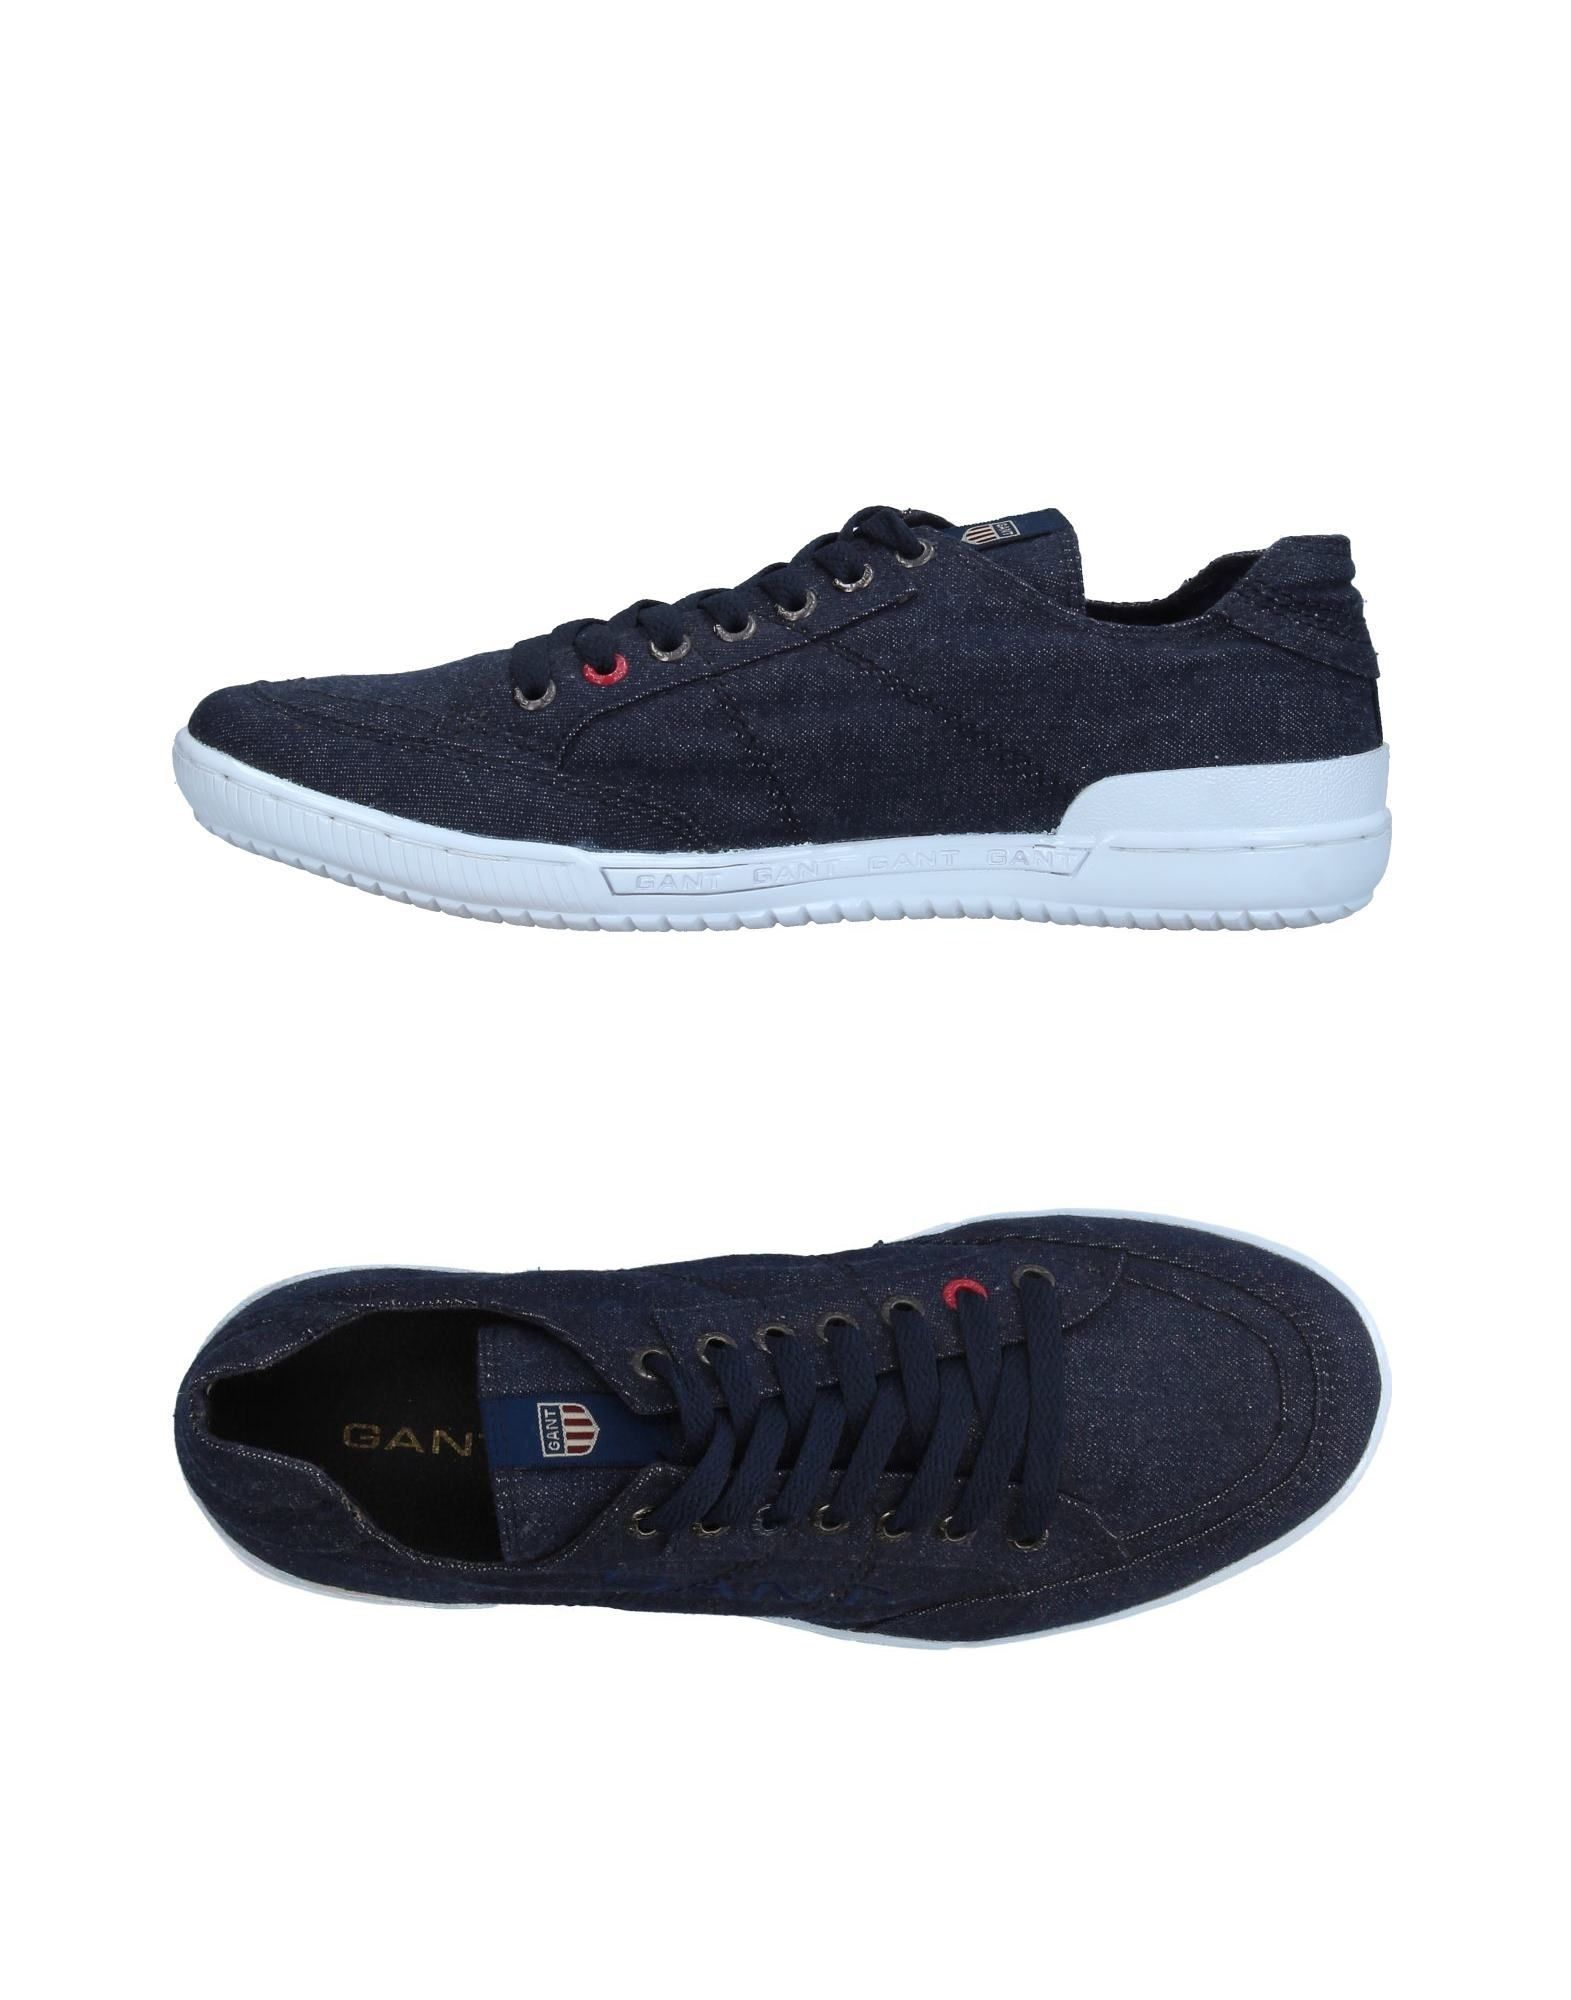 e2bb7bfc4bb5 GANT ΠΑΠΟΥΤΣΙΑ Παπούτσια τένις χαμηλά, Ανδρικά παπούτσια τέννις ...